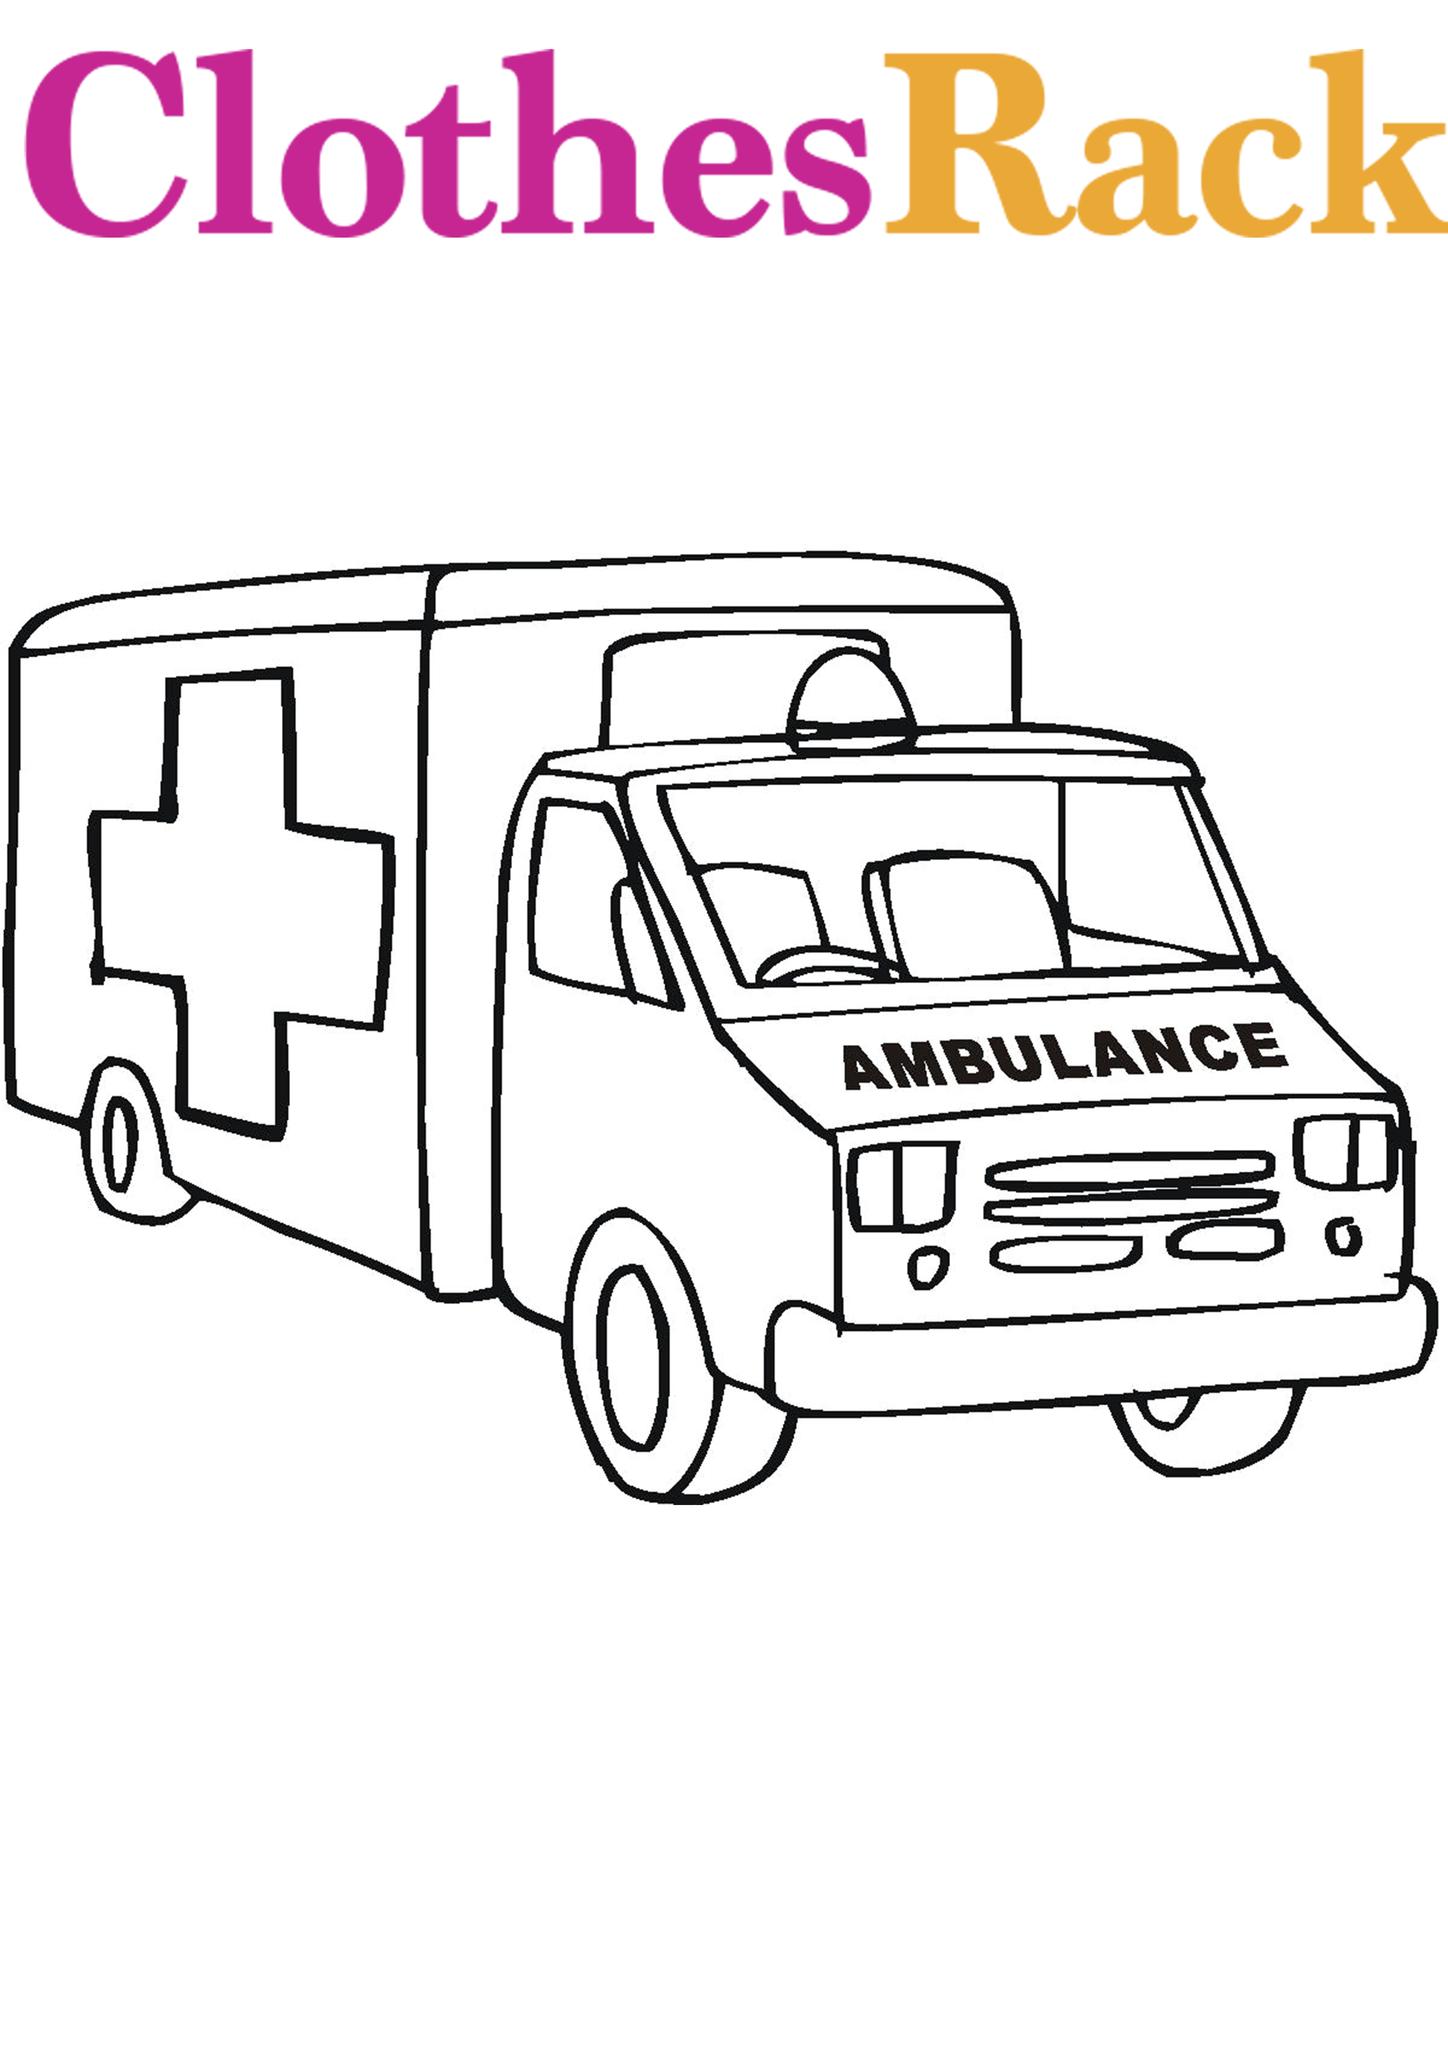 Ambulance Colouring Page Ambulance Colouring Pictures Ambulance Pictures To Colour Colouring Pages Ambulance Pictures Coloring Pages For Kids